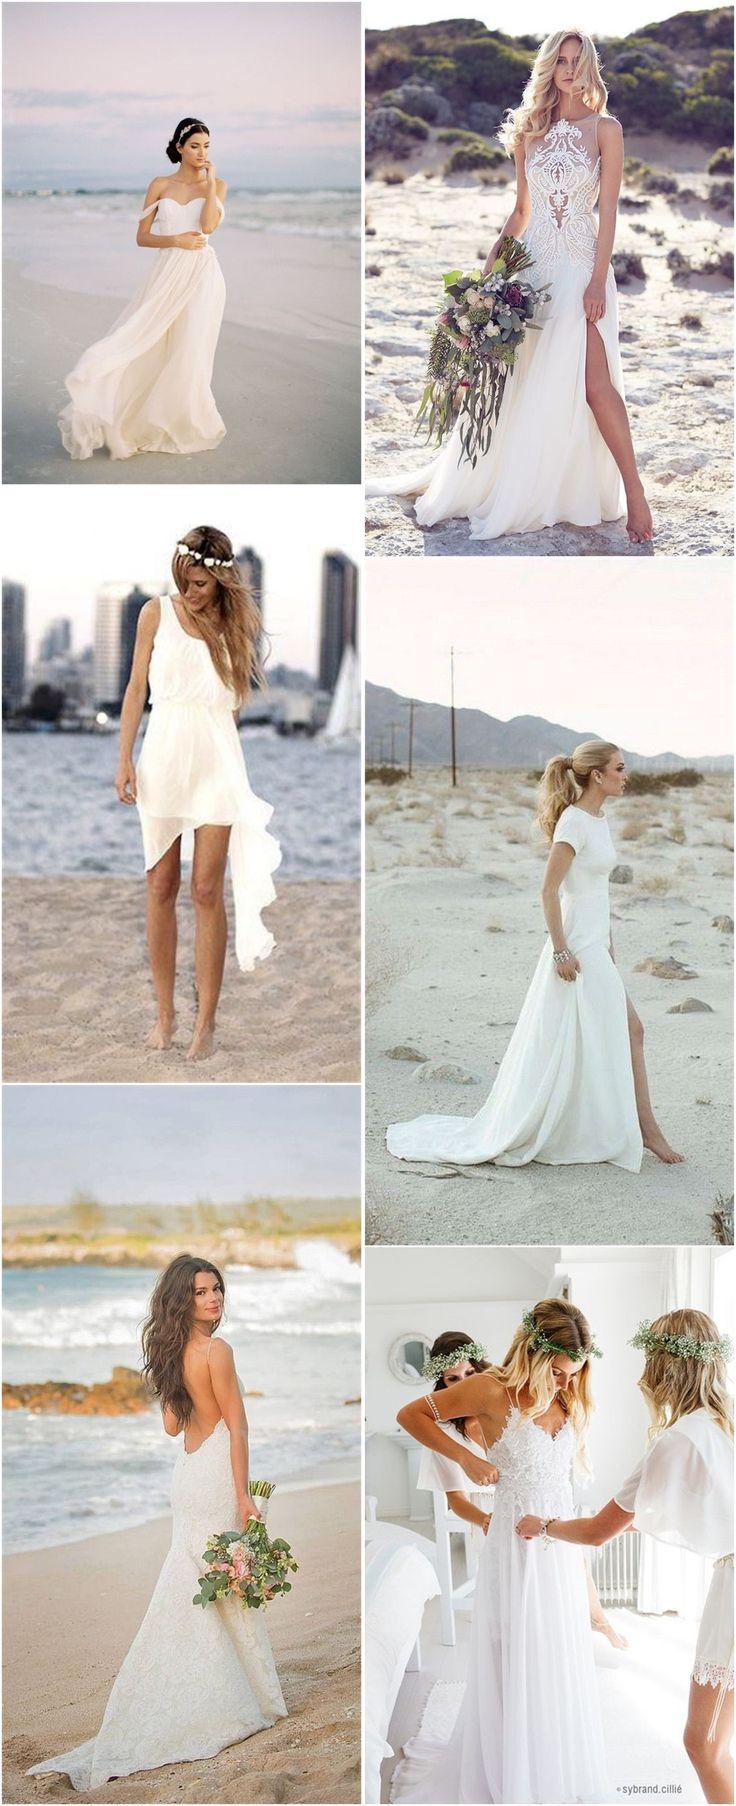 25+ Best Ideas About Beach Wedding Dresses On Pinterest